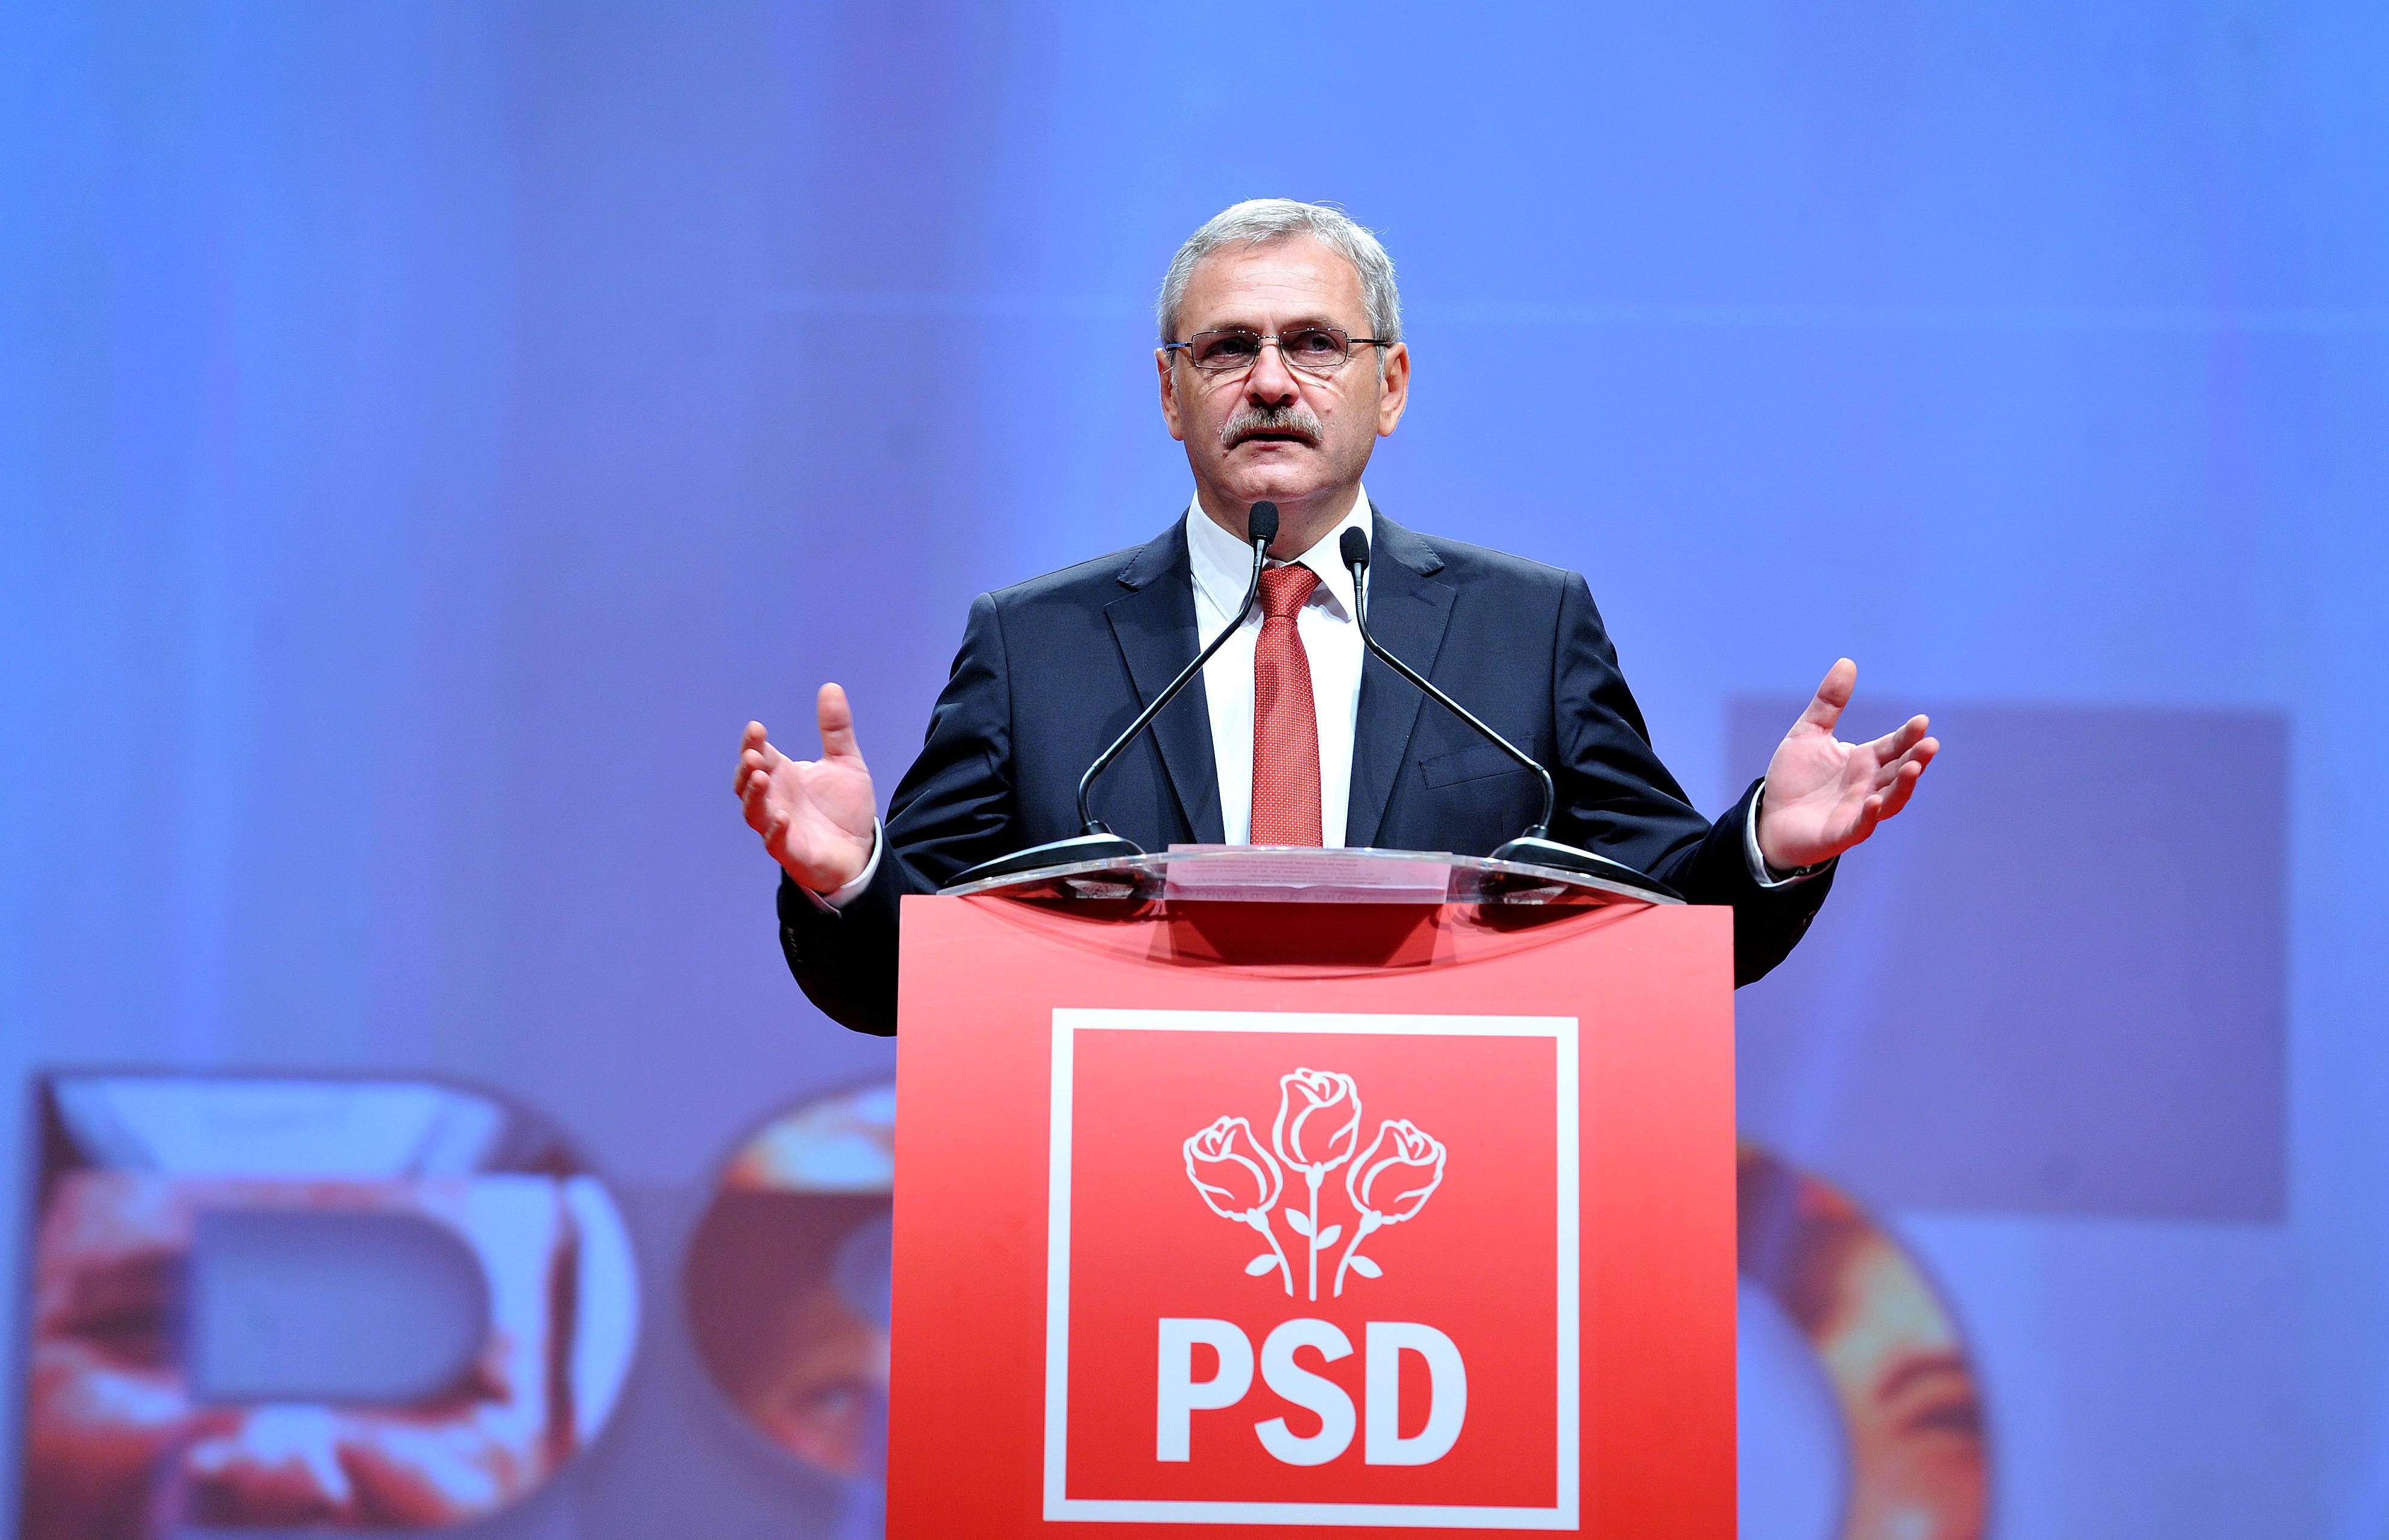 Liviu Dragnea, leader du PSD